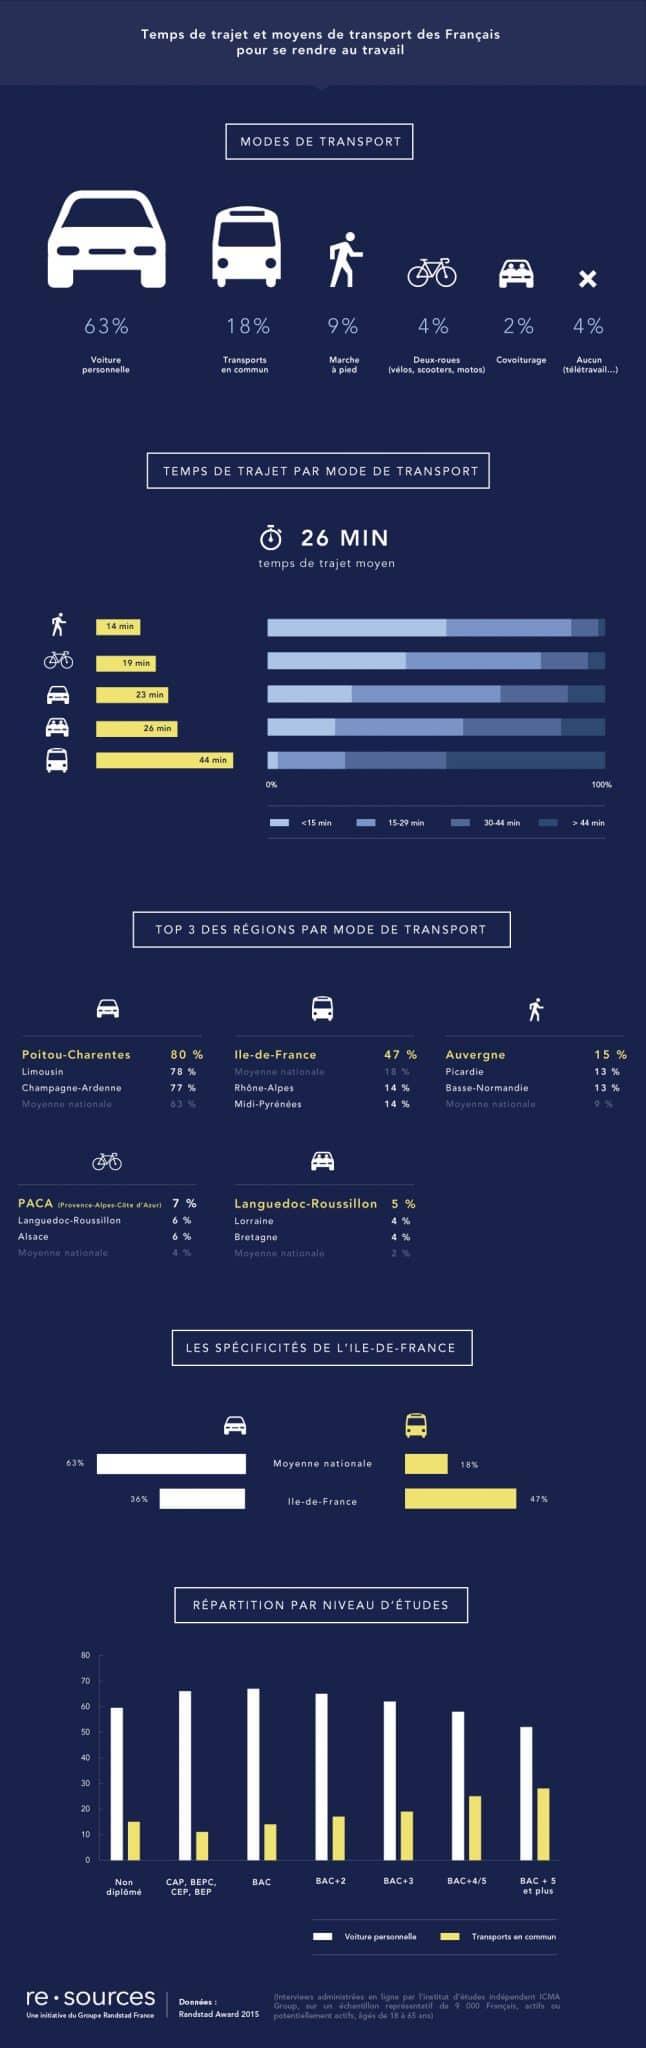 rapport randstad trajets domicile travail